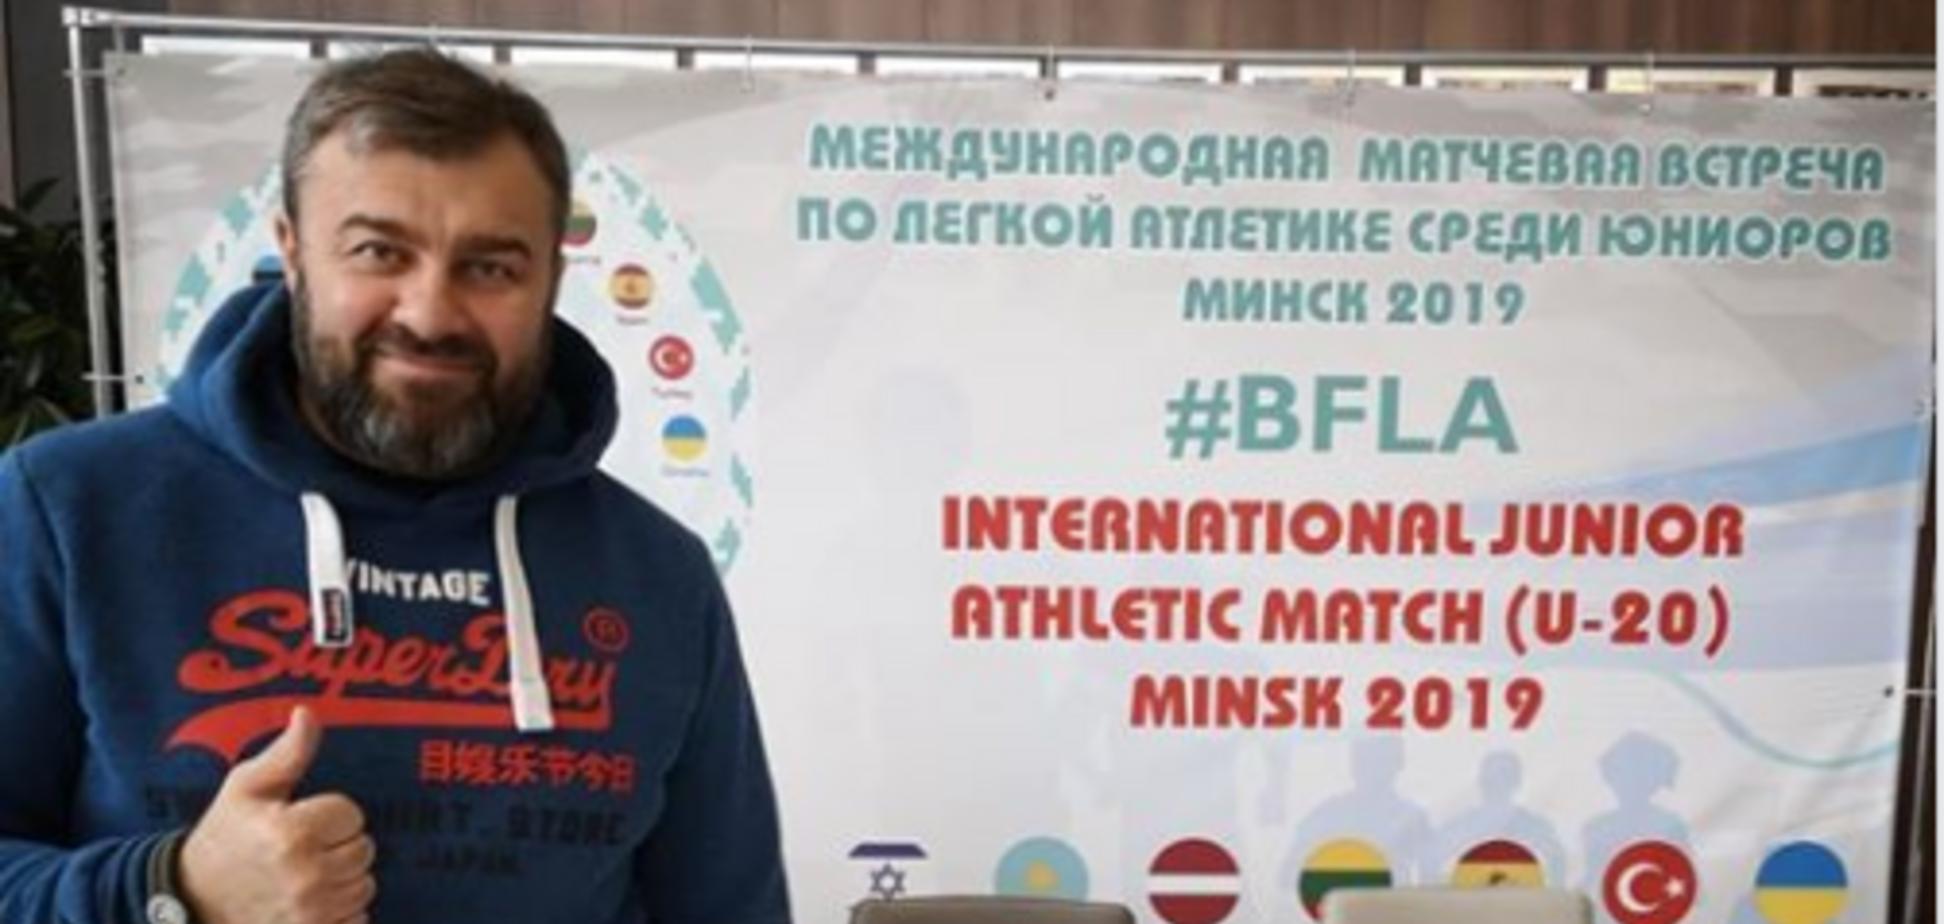 Пореченкова из-за любви к 'ДНР' затравили на турнире в Беларуси